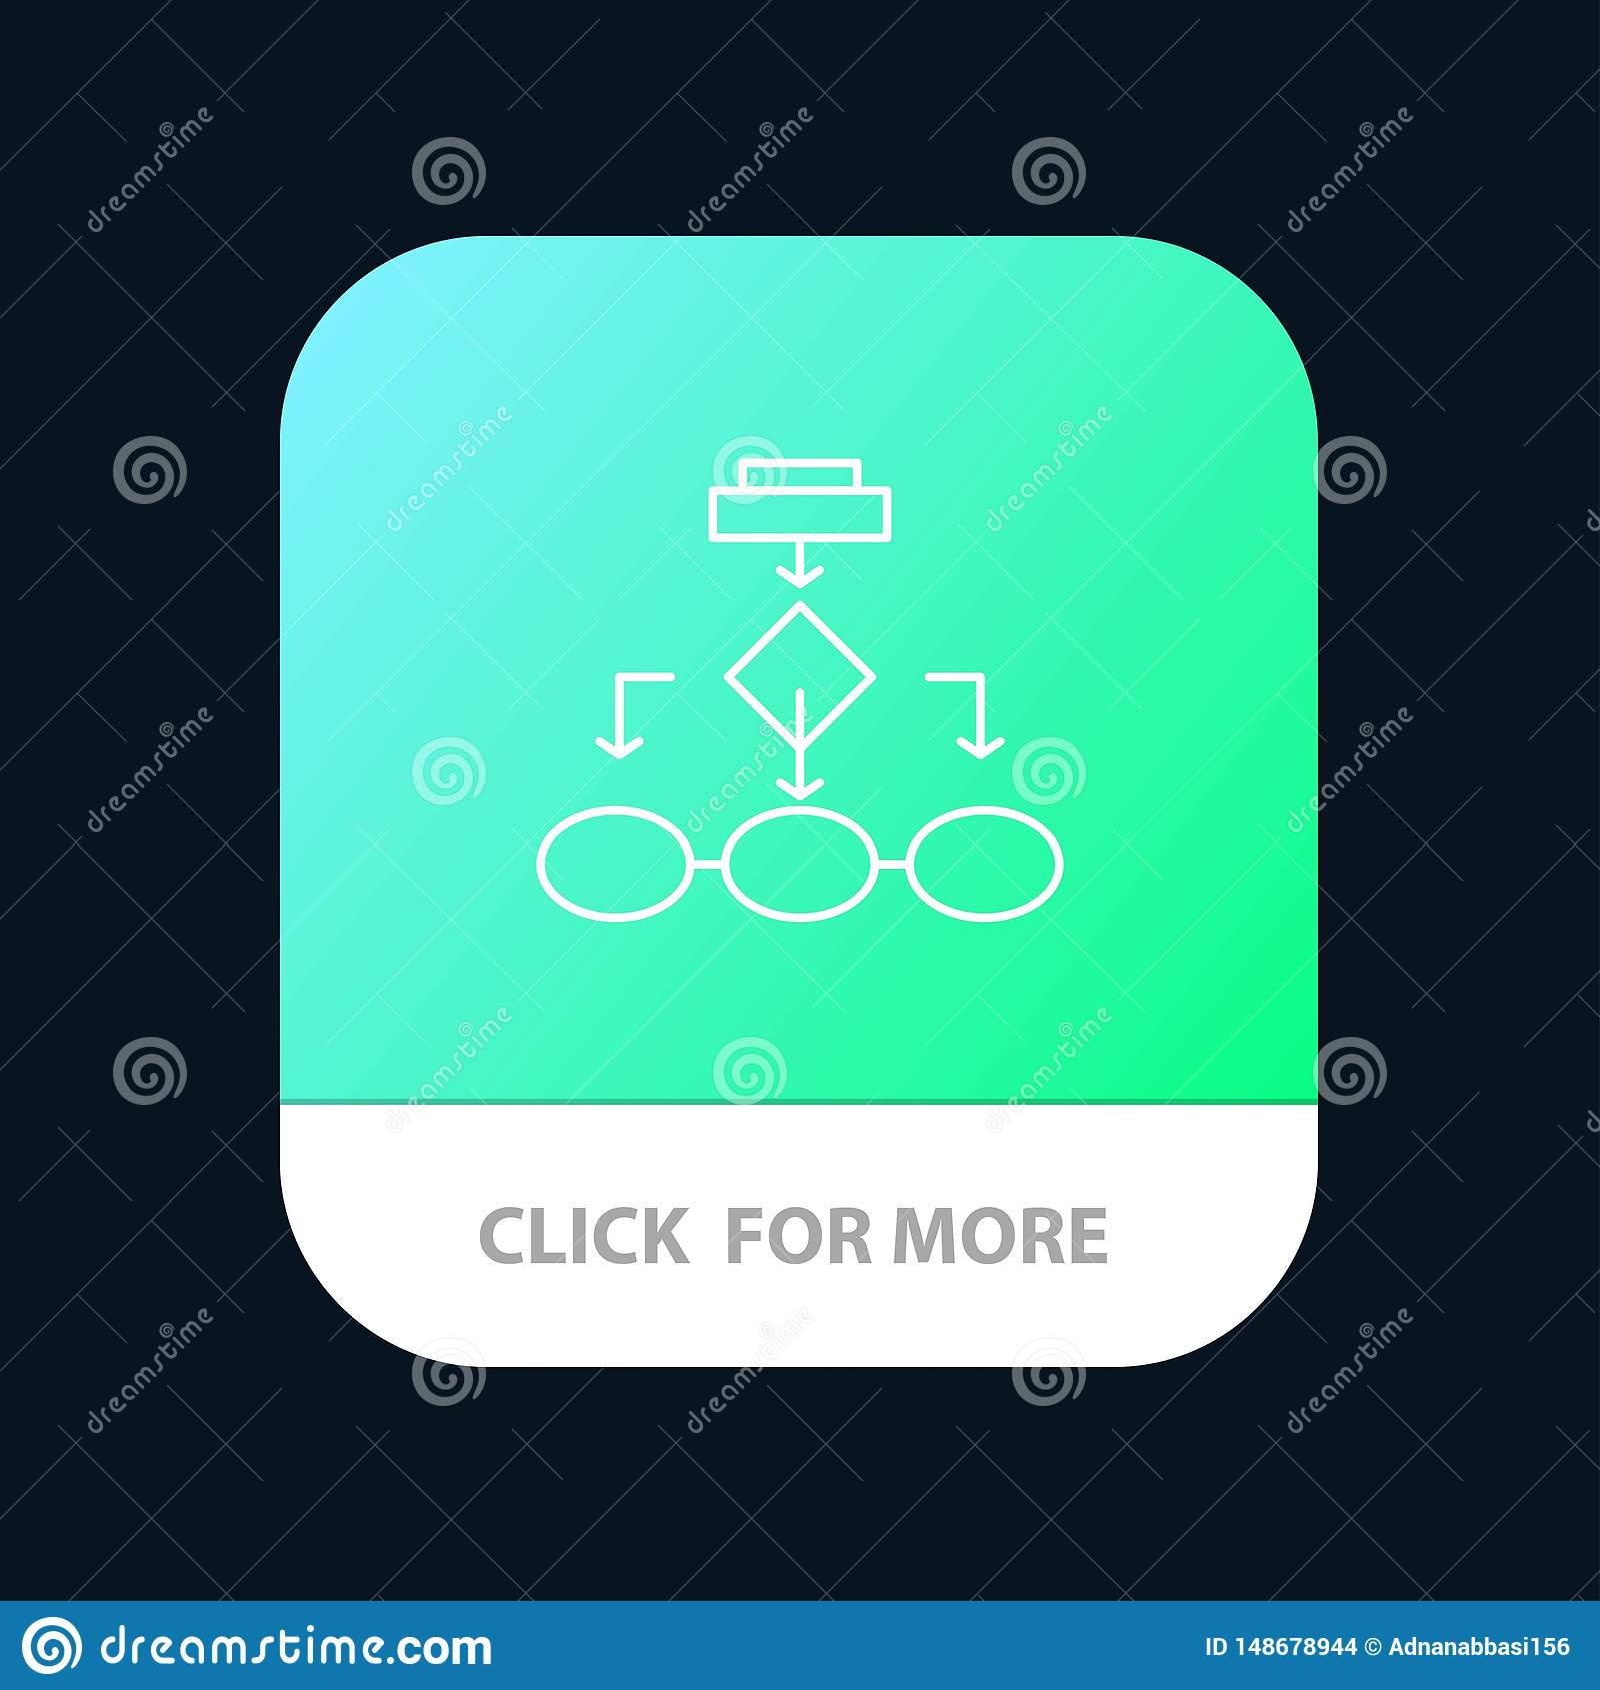 Flowchart, Algorithm, Business, Data Architecture, Scheme, Structure, Workflow Mobile App Button. Android and IOS Line Version